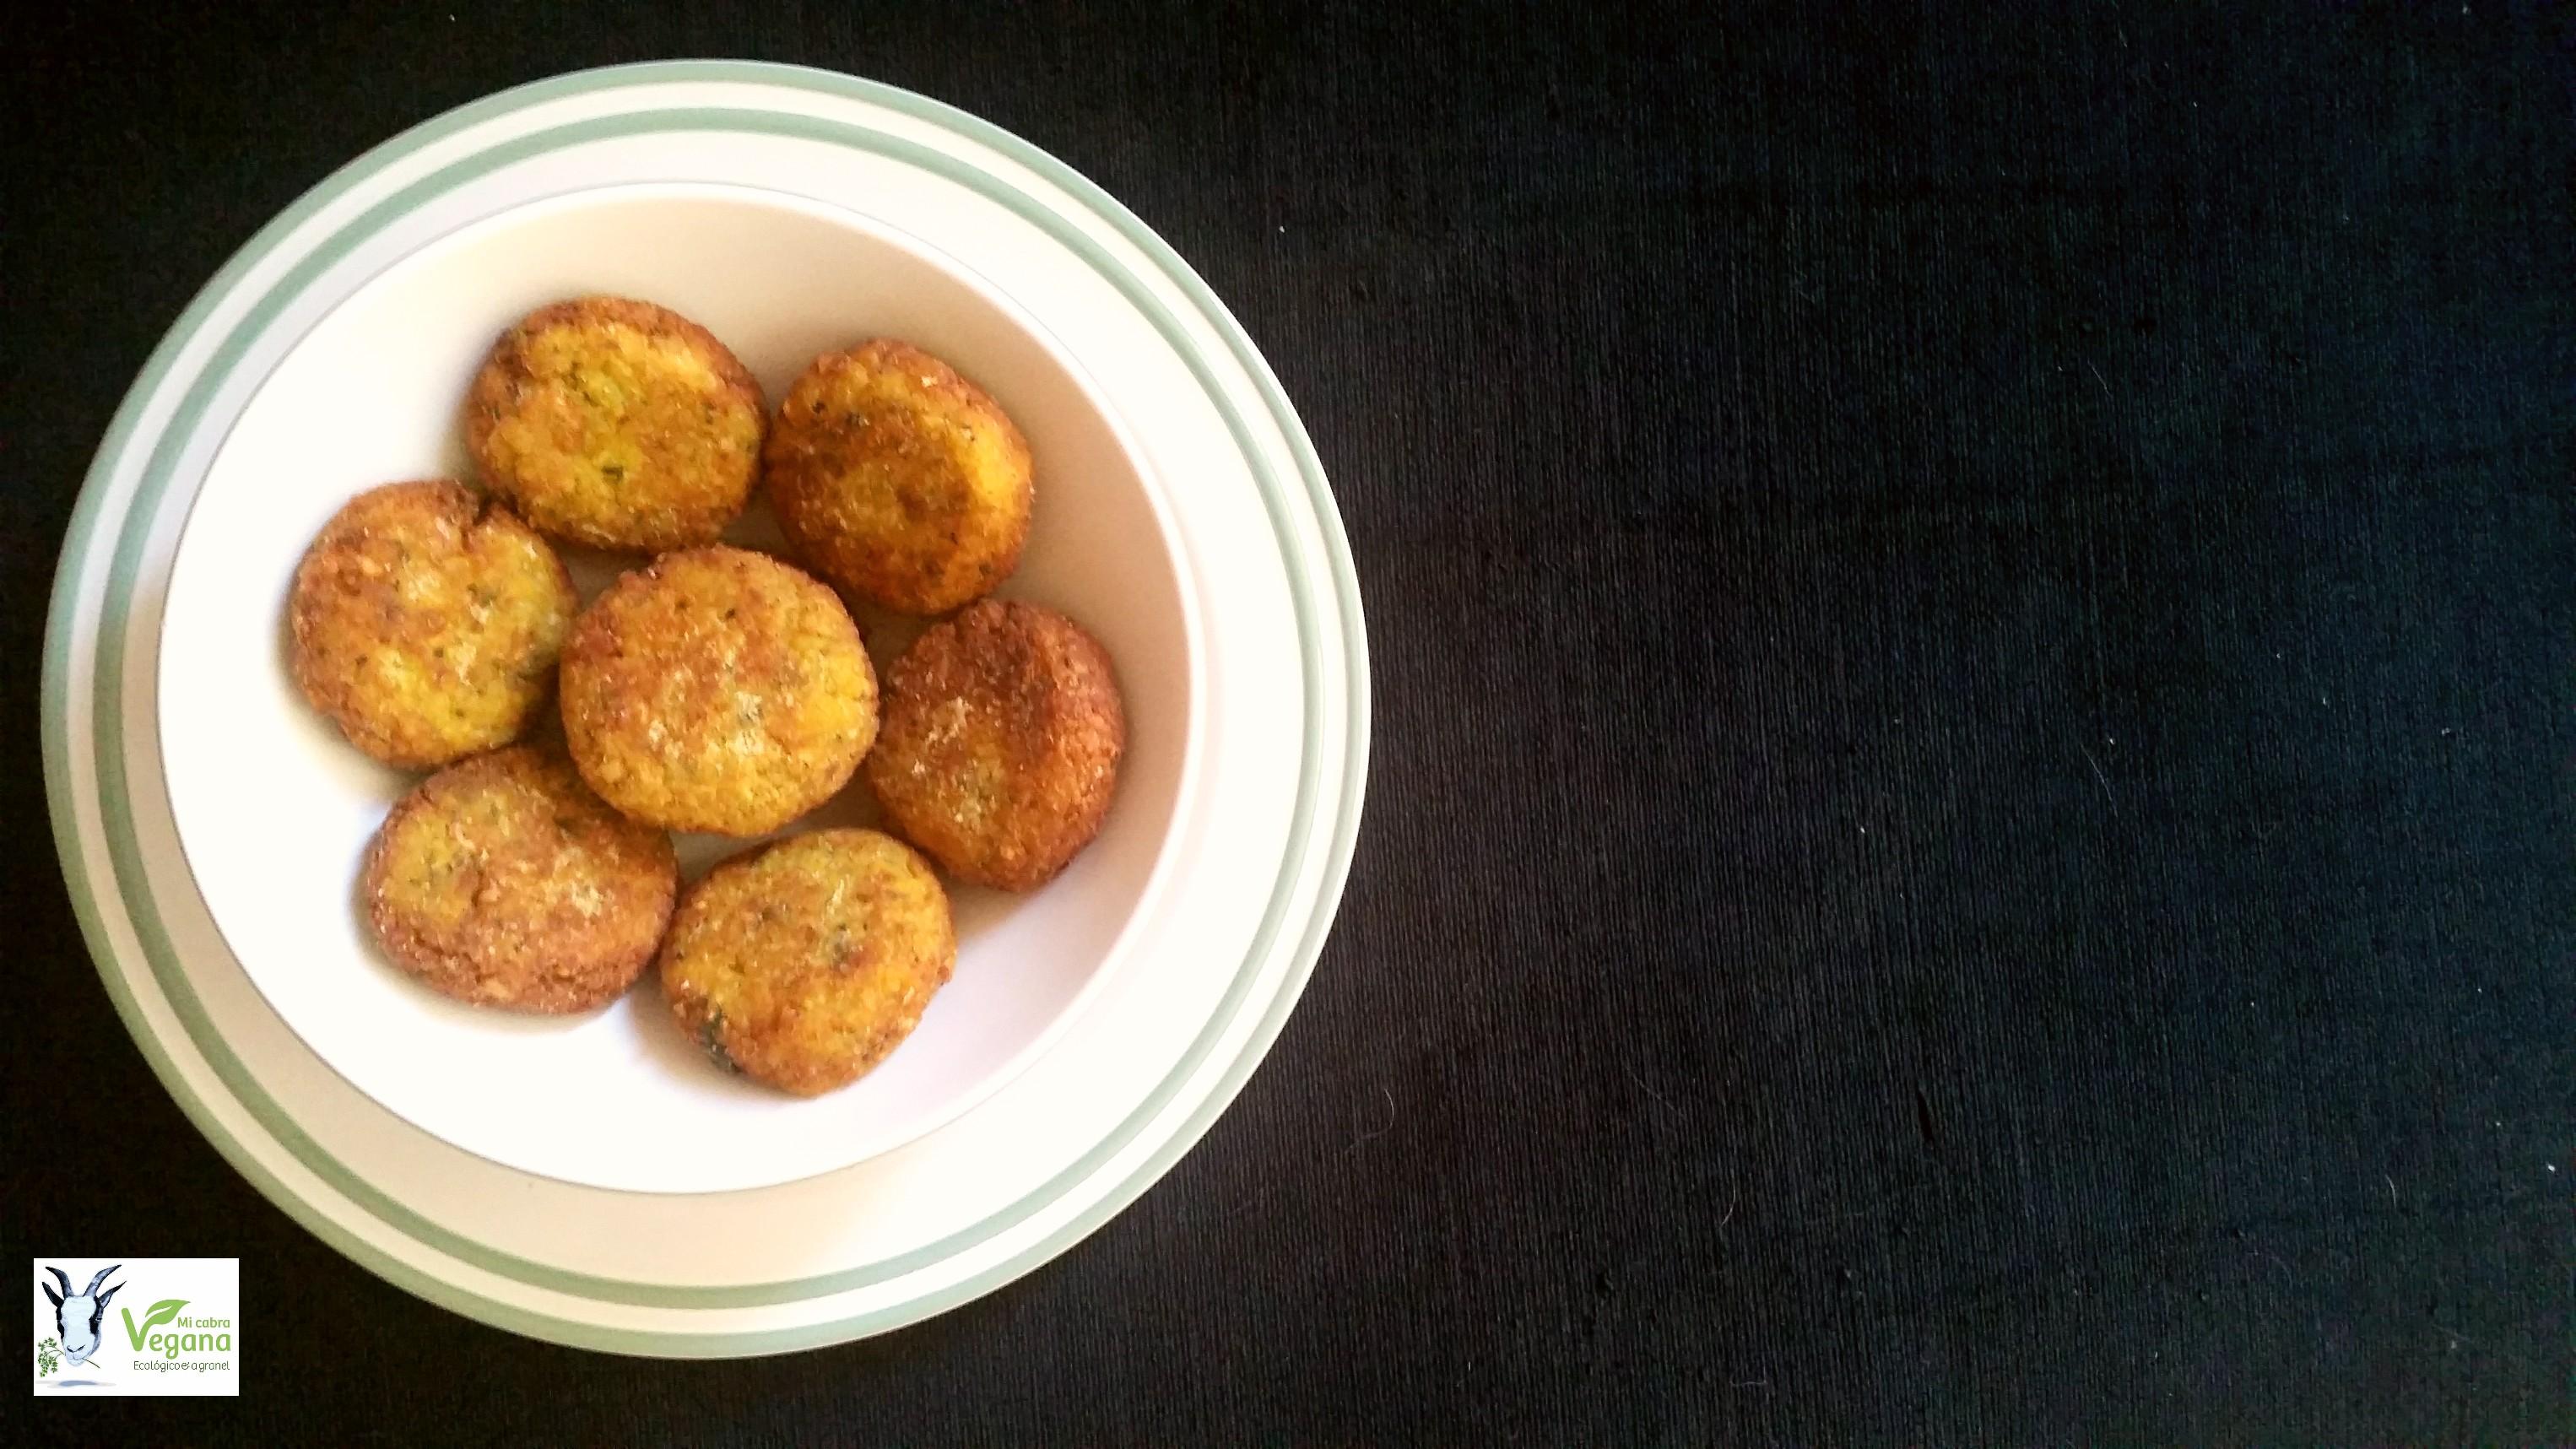 falafel, croqueta de garbanzo